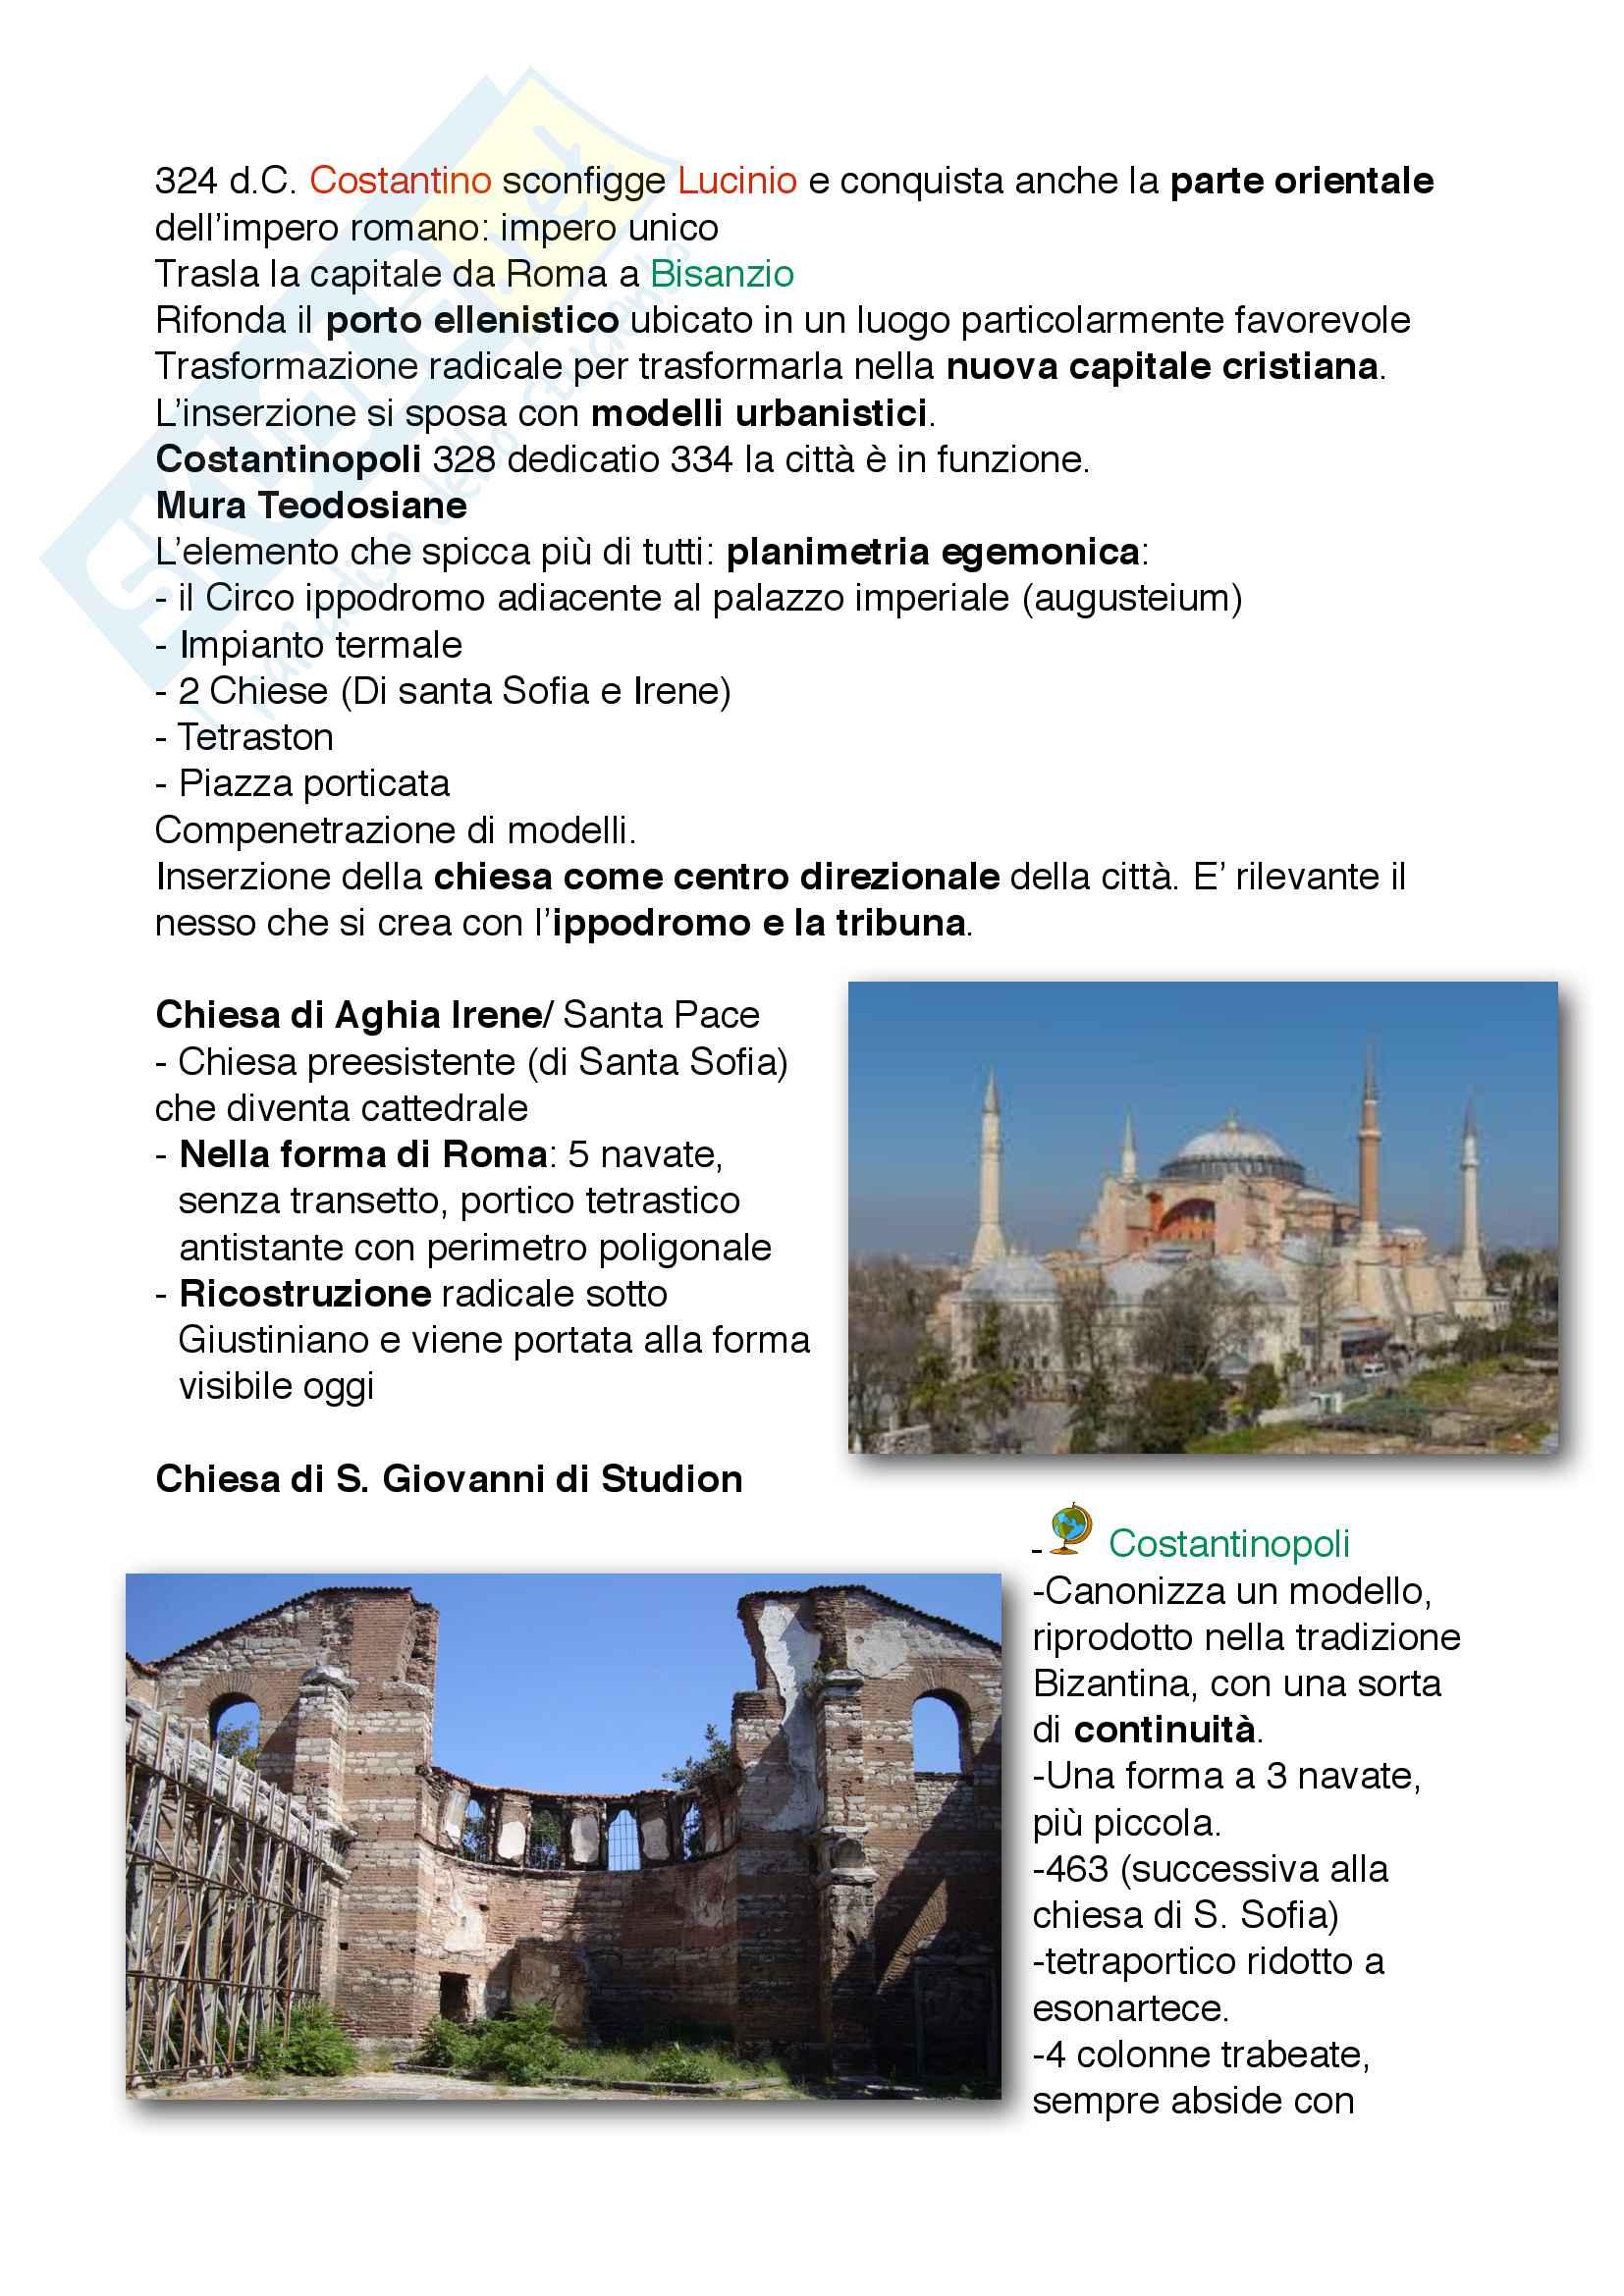 33 Costantinopoli